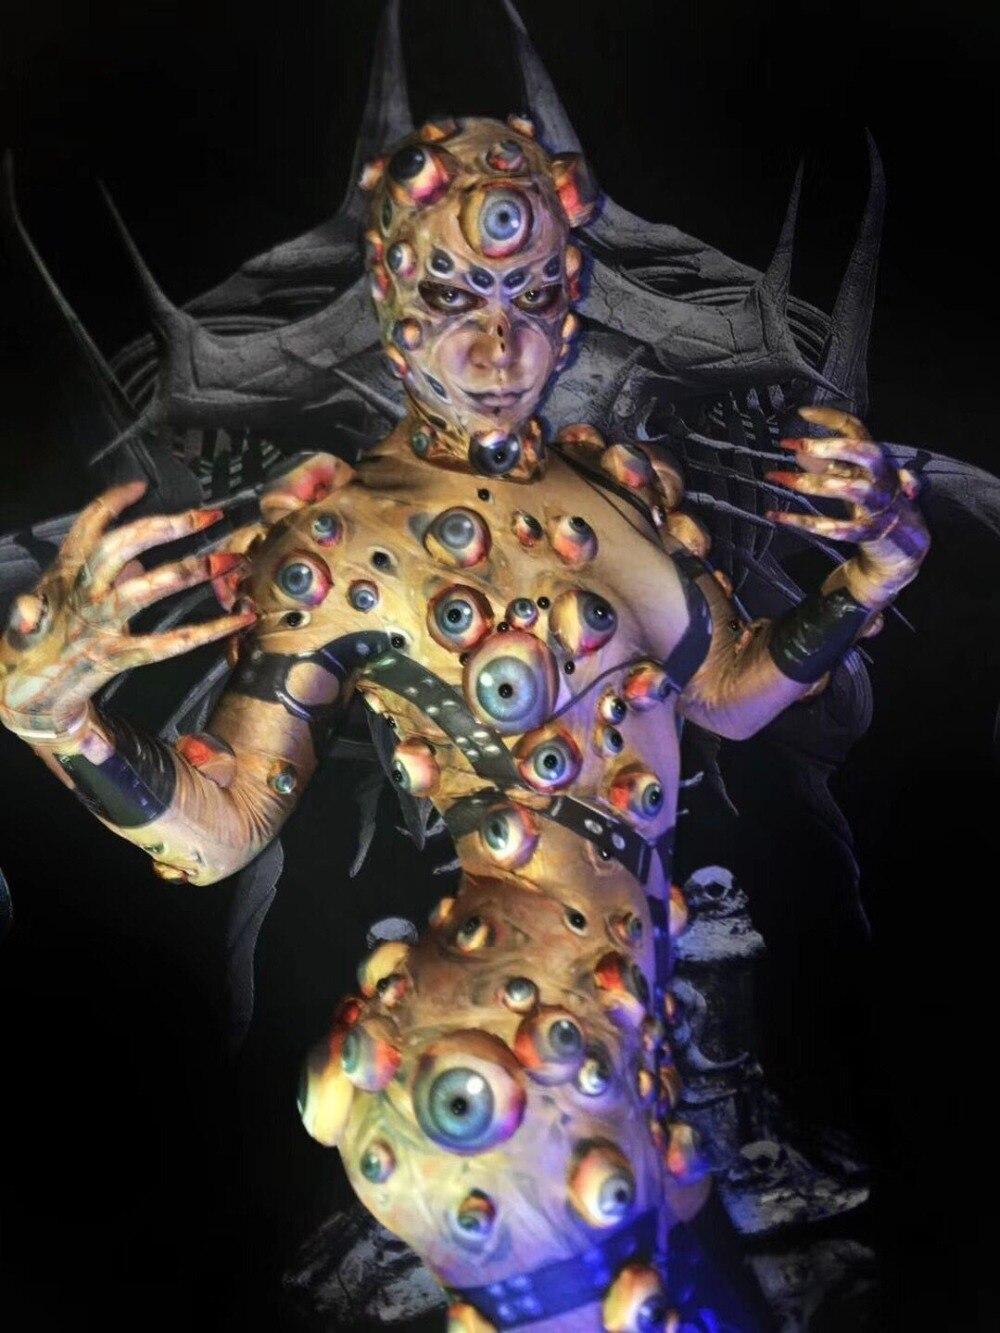 Halloween Printed Eyeball Stretch Jumpsuit Evening Party Bodysuit Nightclub Cosplay Leggings Women Or Men's DJ Singer Jumpsuit